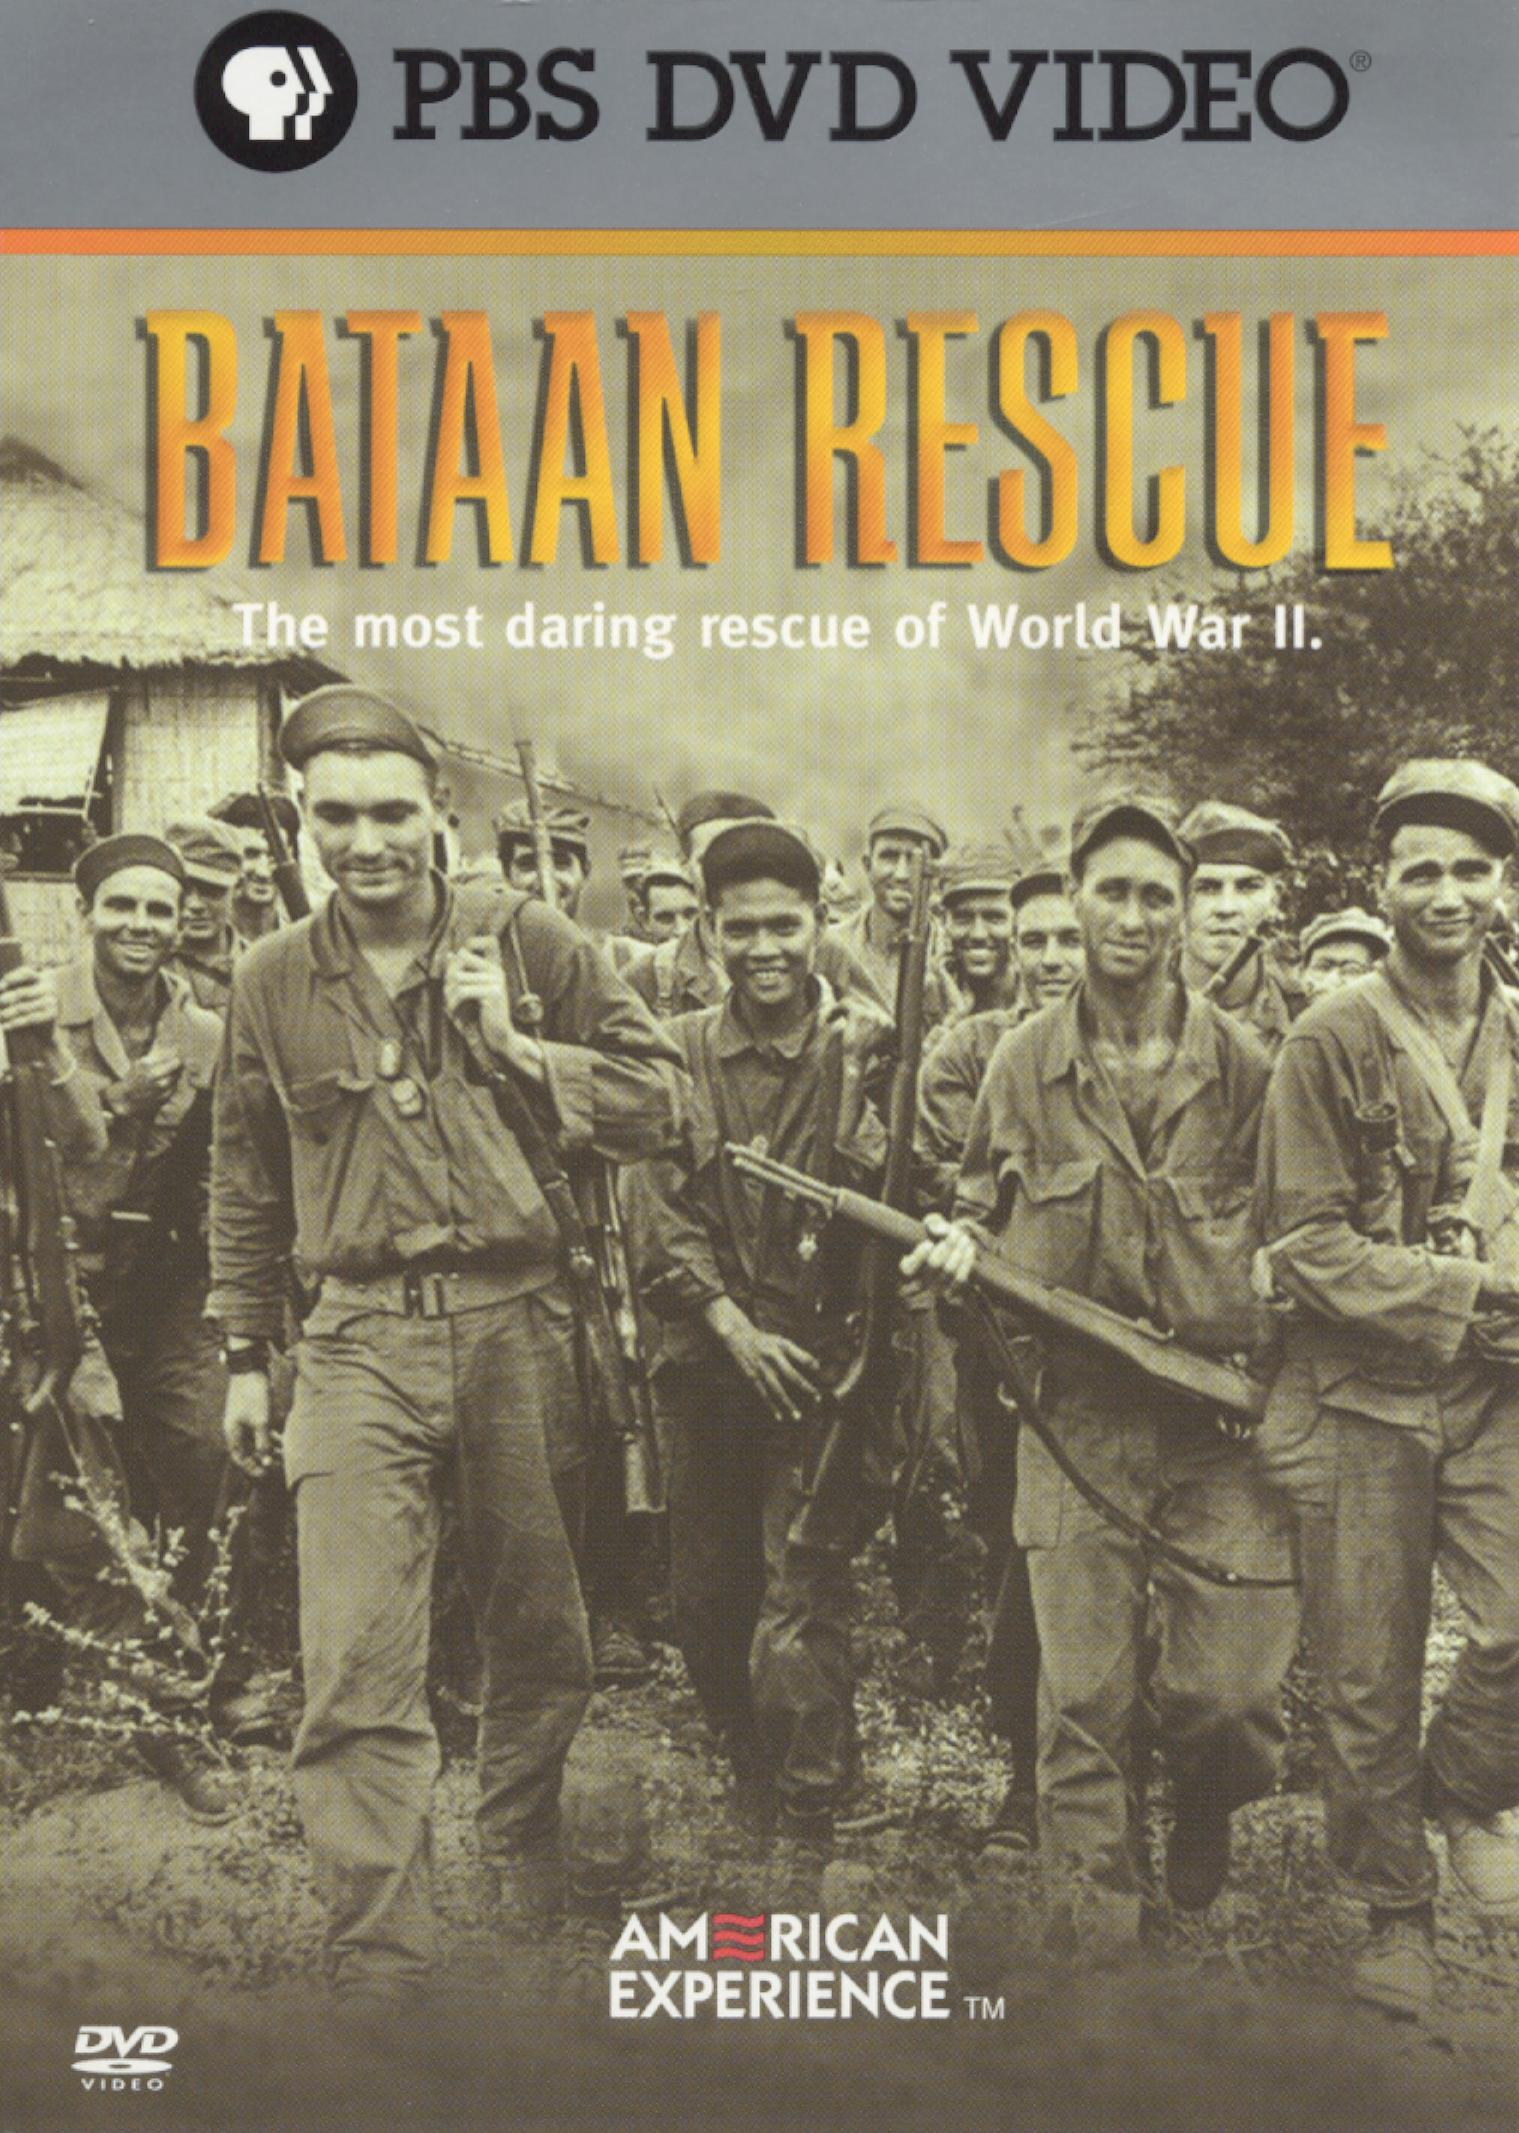 American Experience: Bataan Rescue